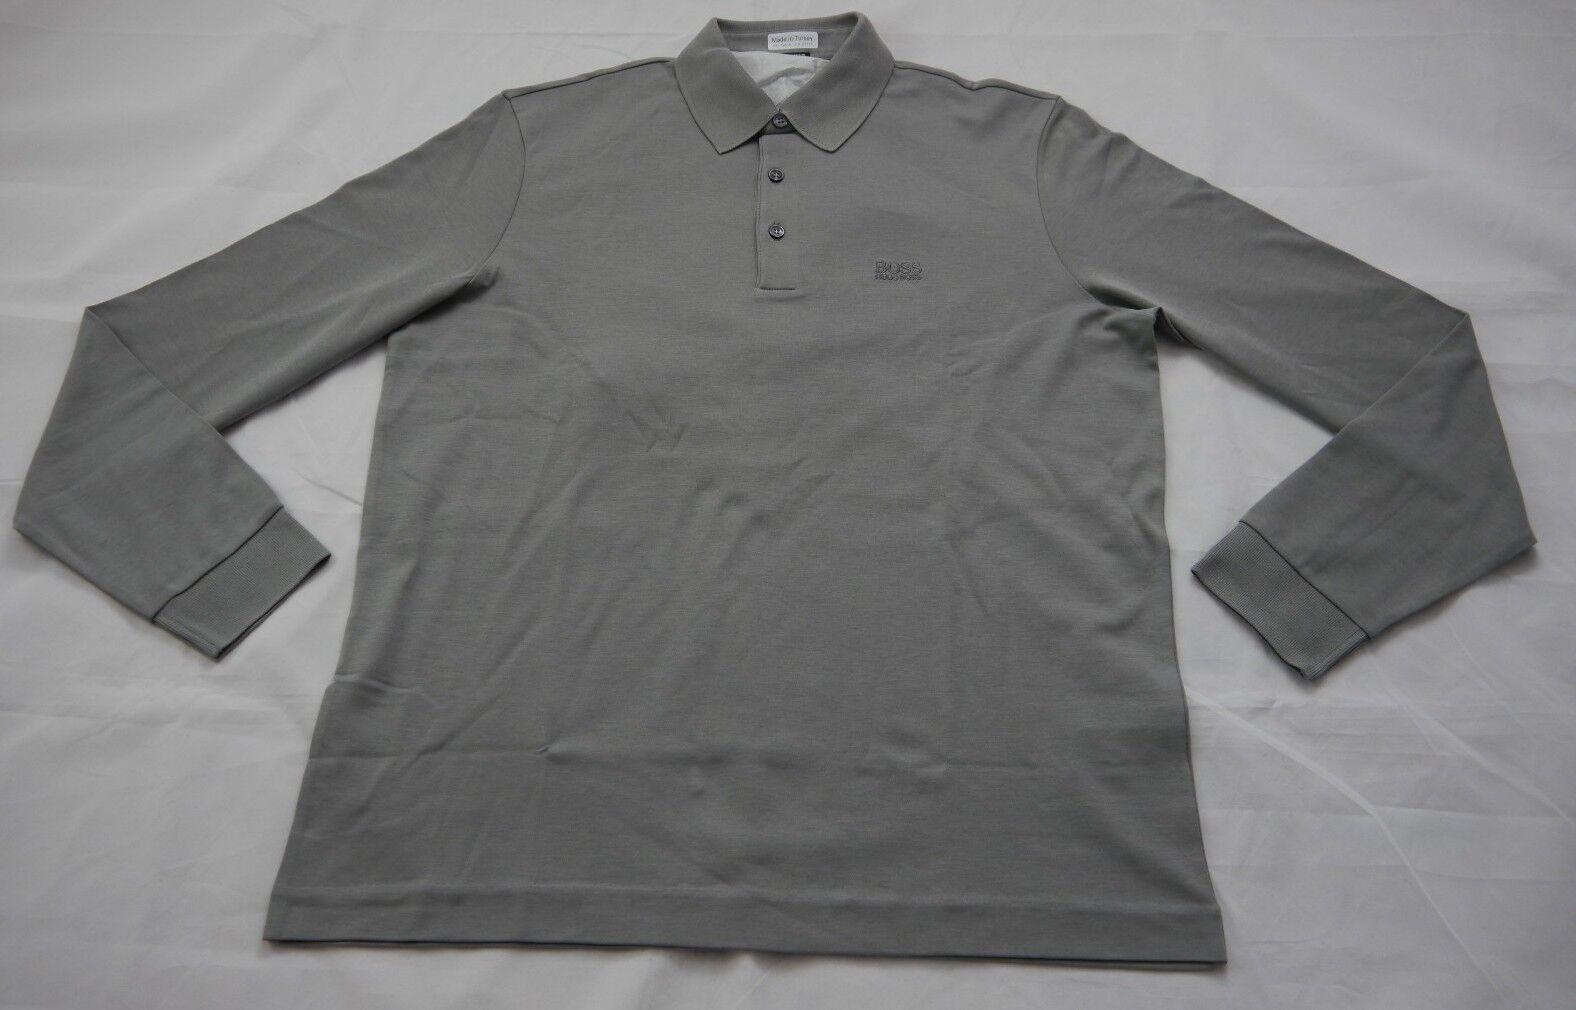 Hugo Boss Pima Cotton Solid grau Polo Sweater Sz L BNWT 100% Authentic